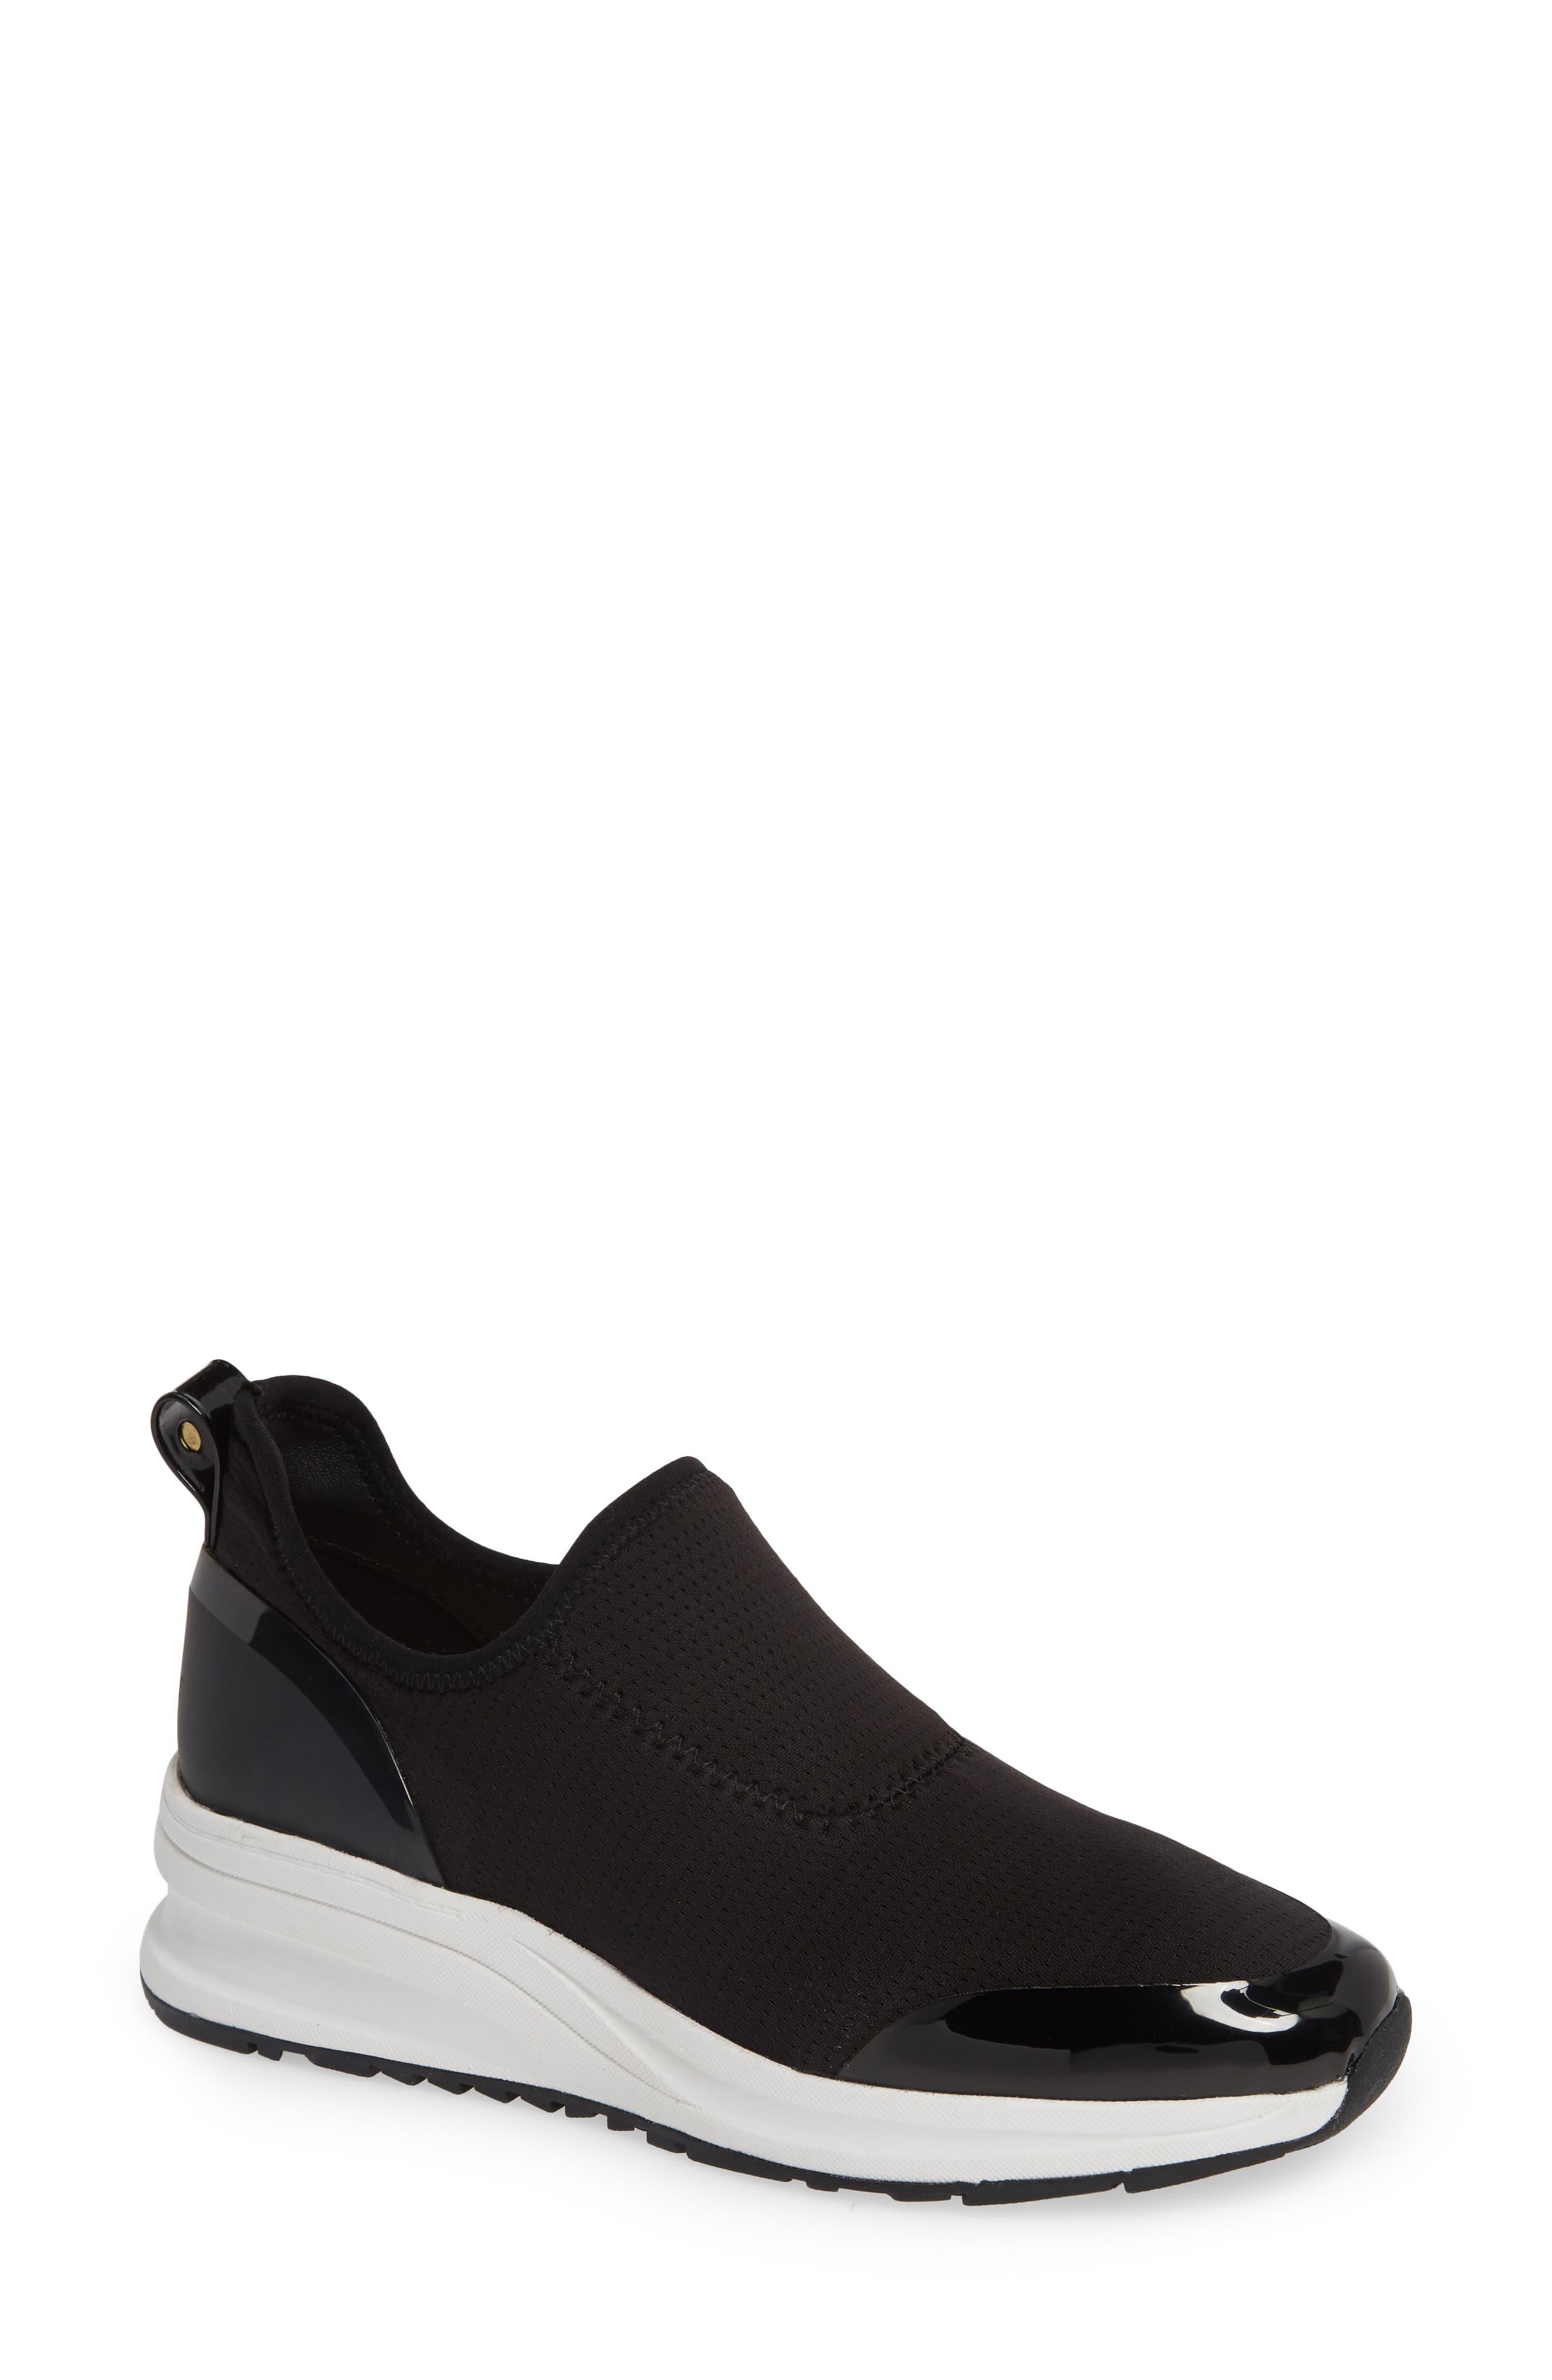 TARYN ROSE Zabella Slip-On Sneaker, Main, color, BLACK STRETCH FABRIC